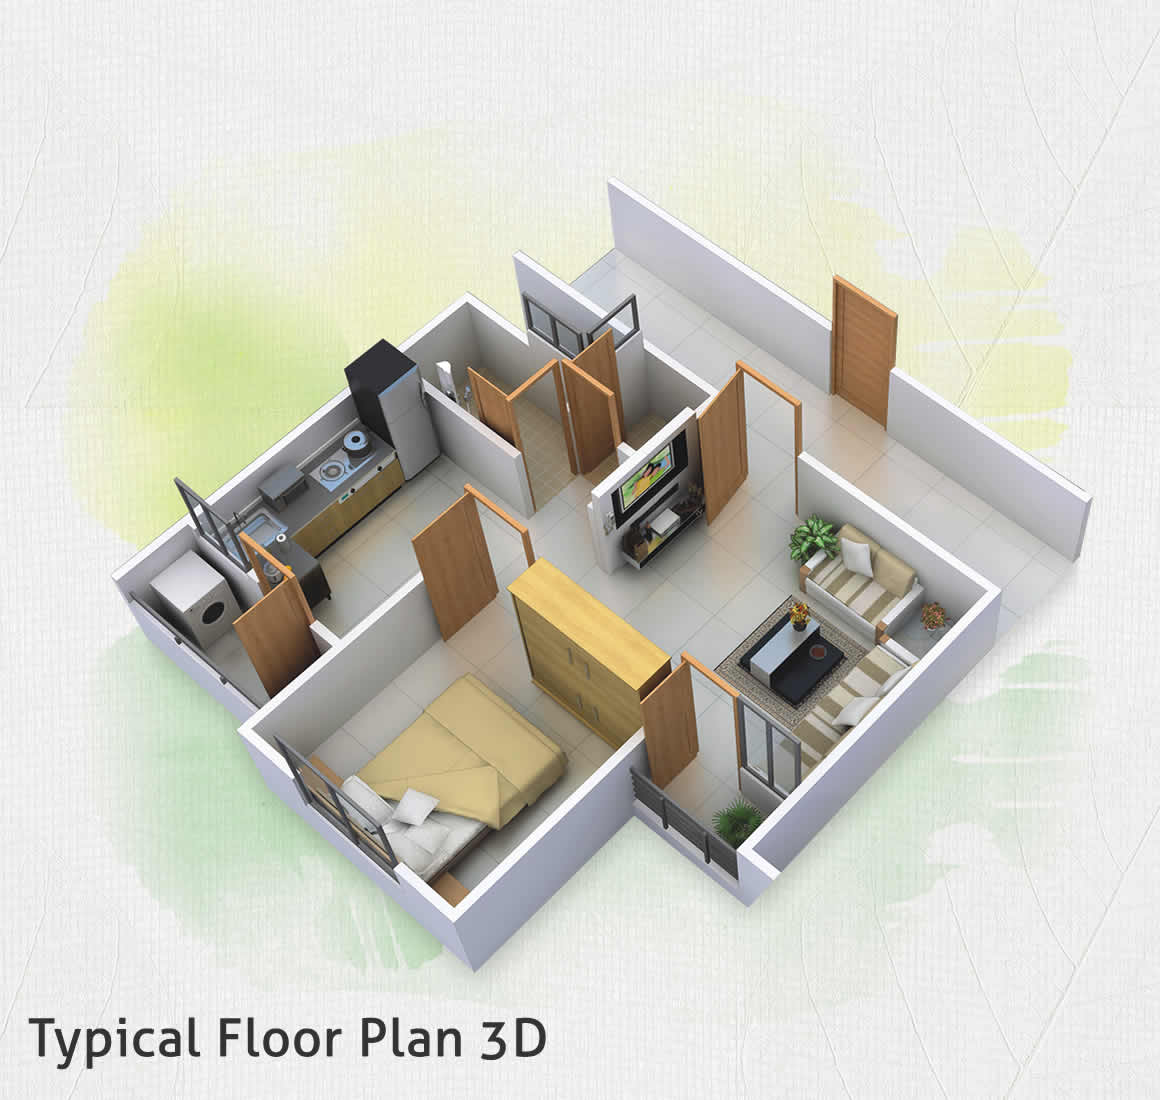 Jigar Raghukul Floor Plan